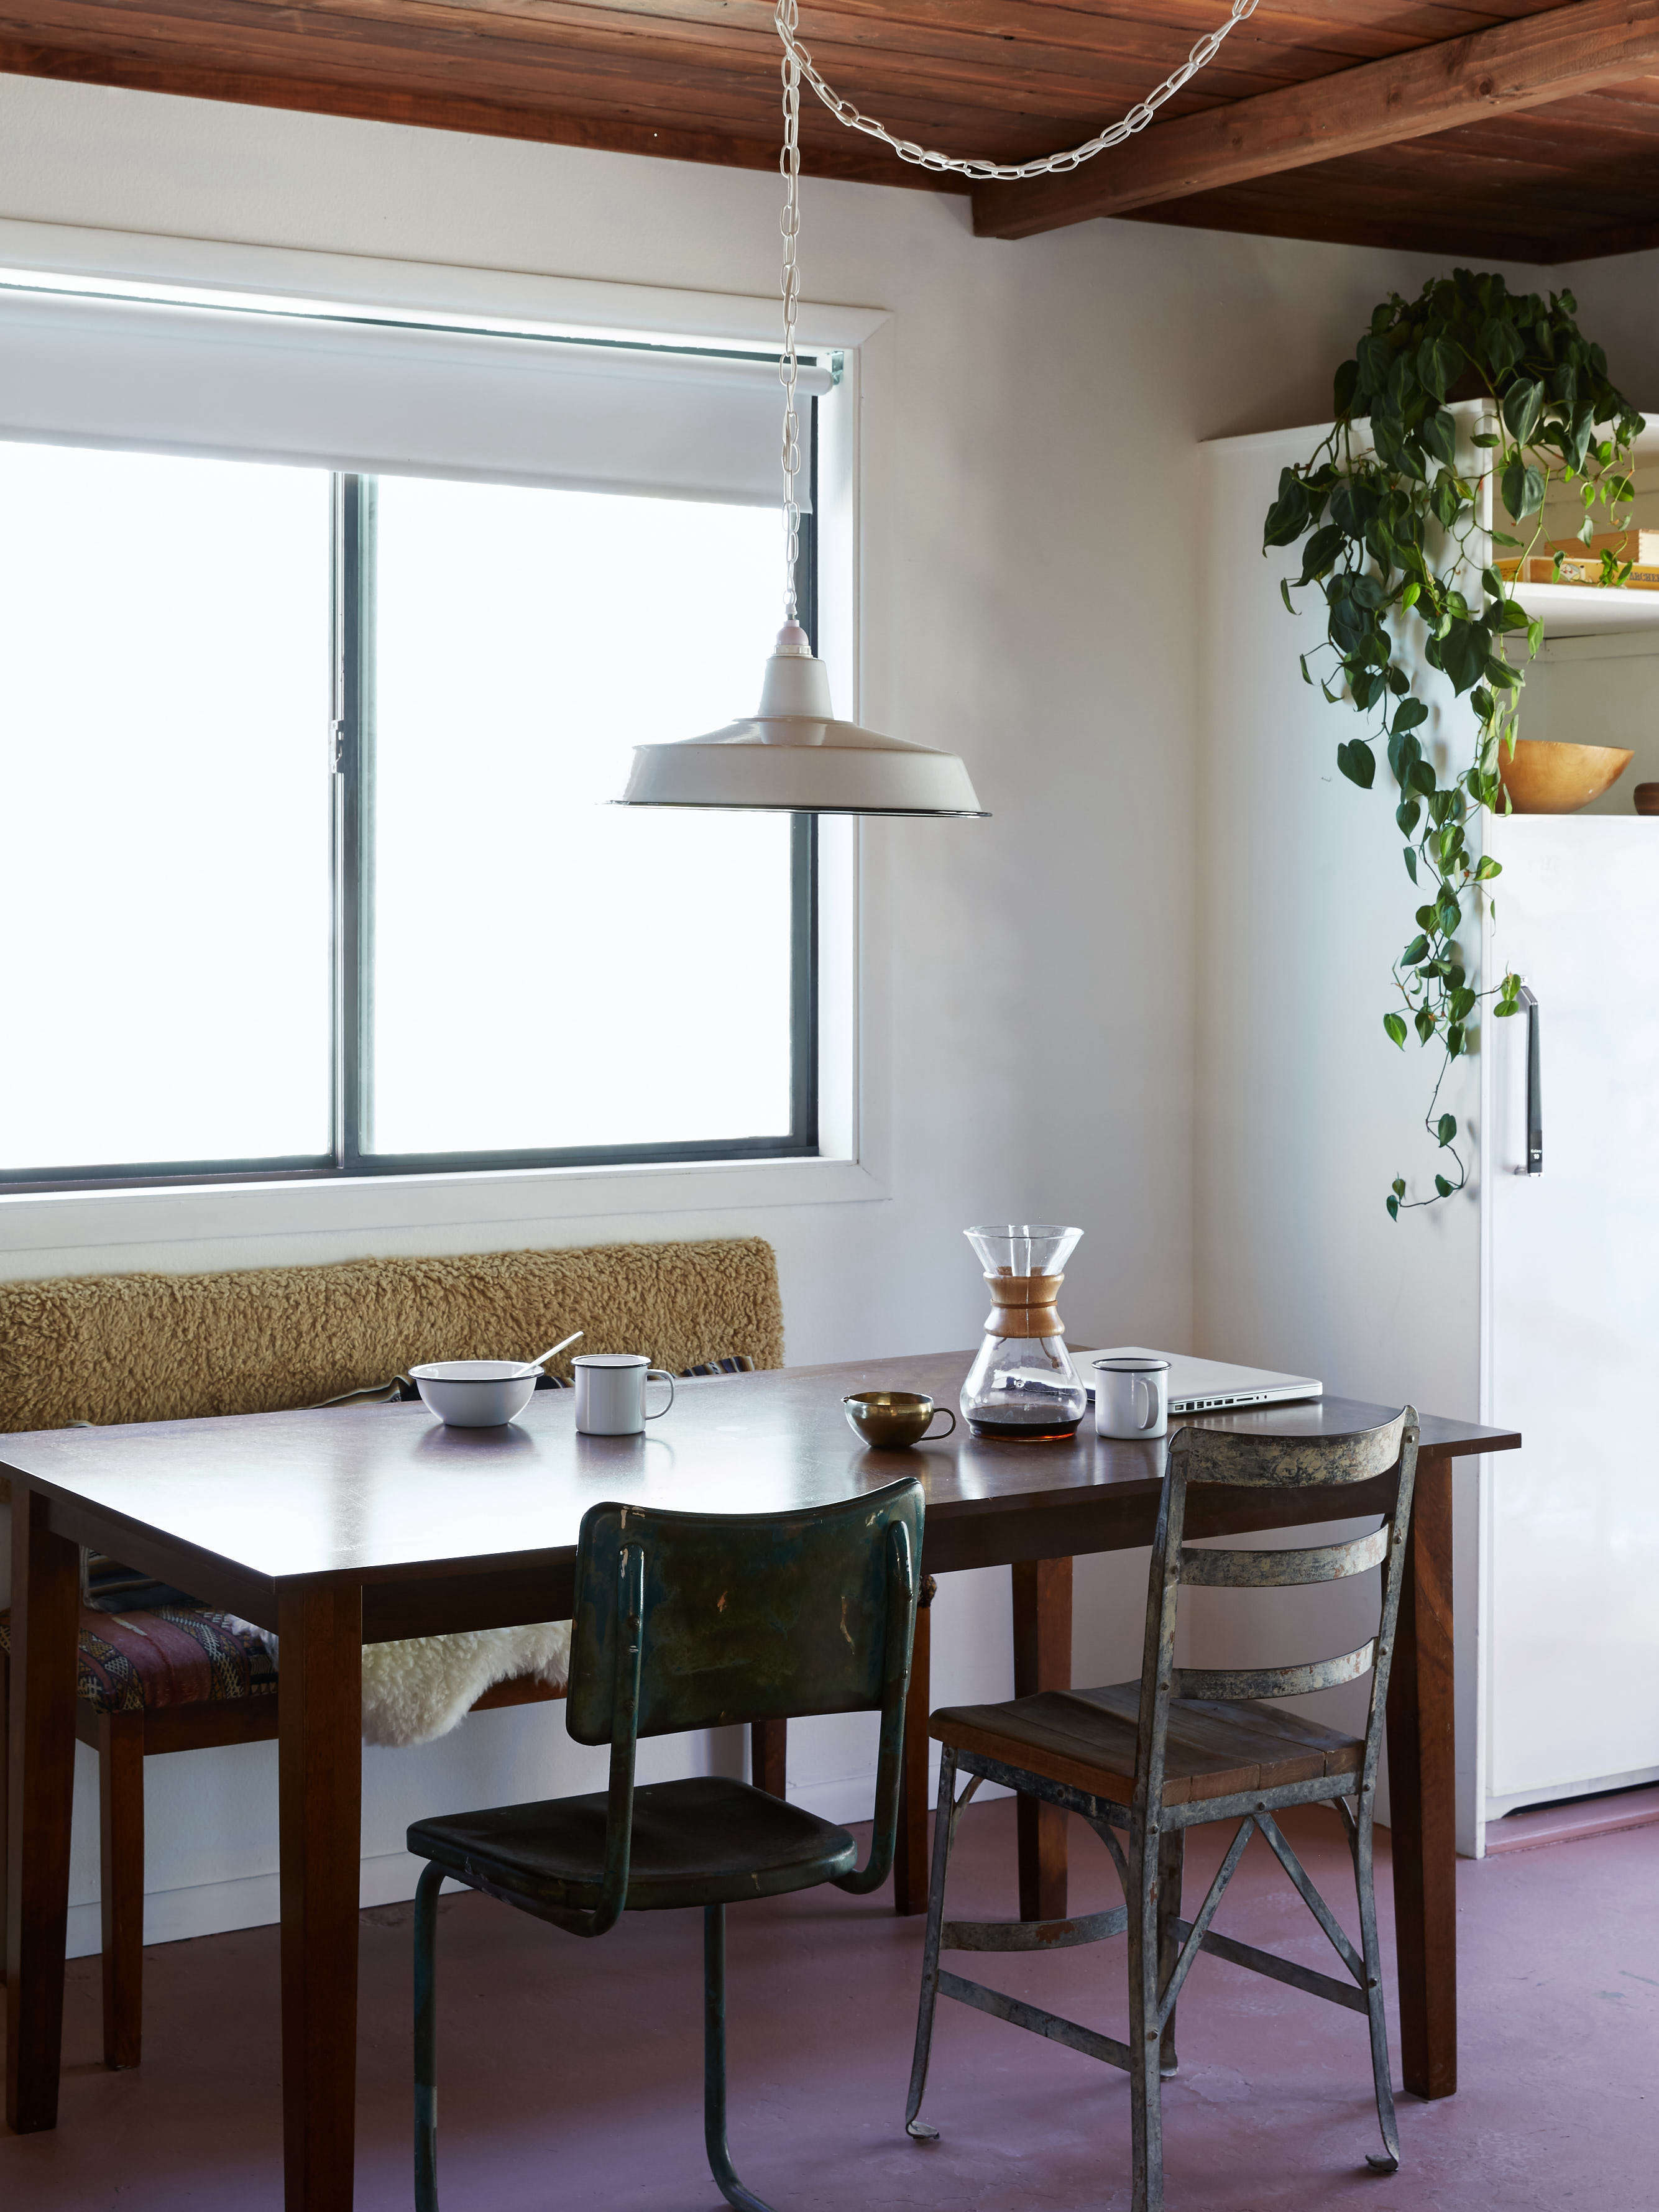 joshua tree casita vintage dining furnishings and porcelain factory light, kate sears photo